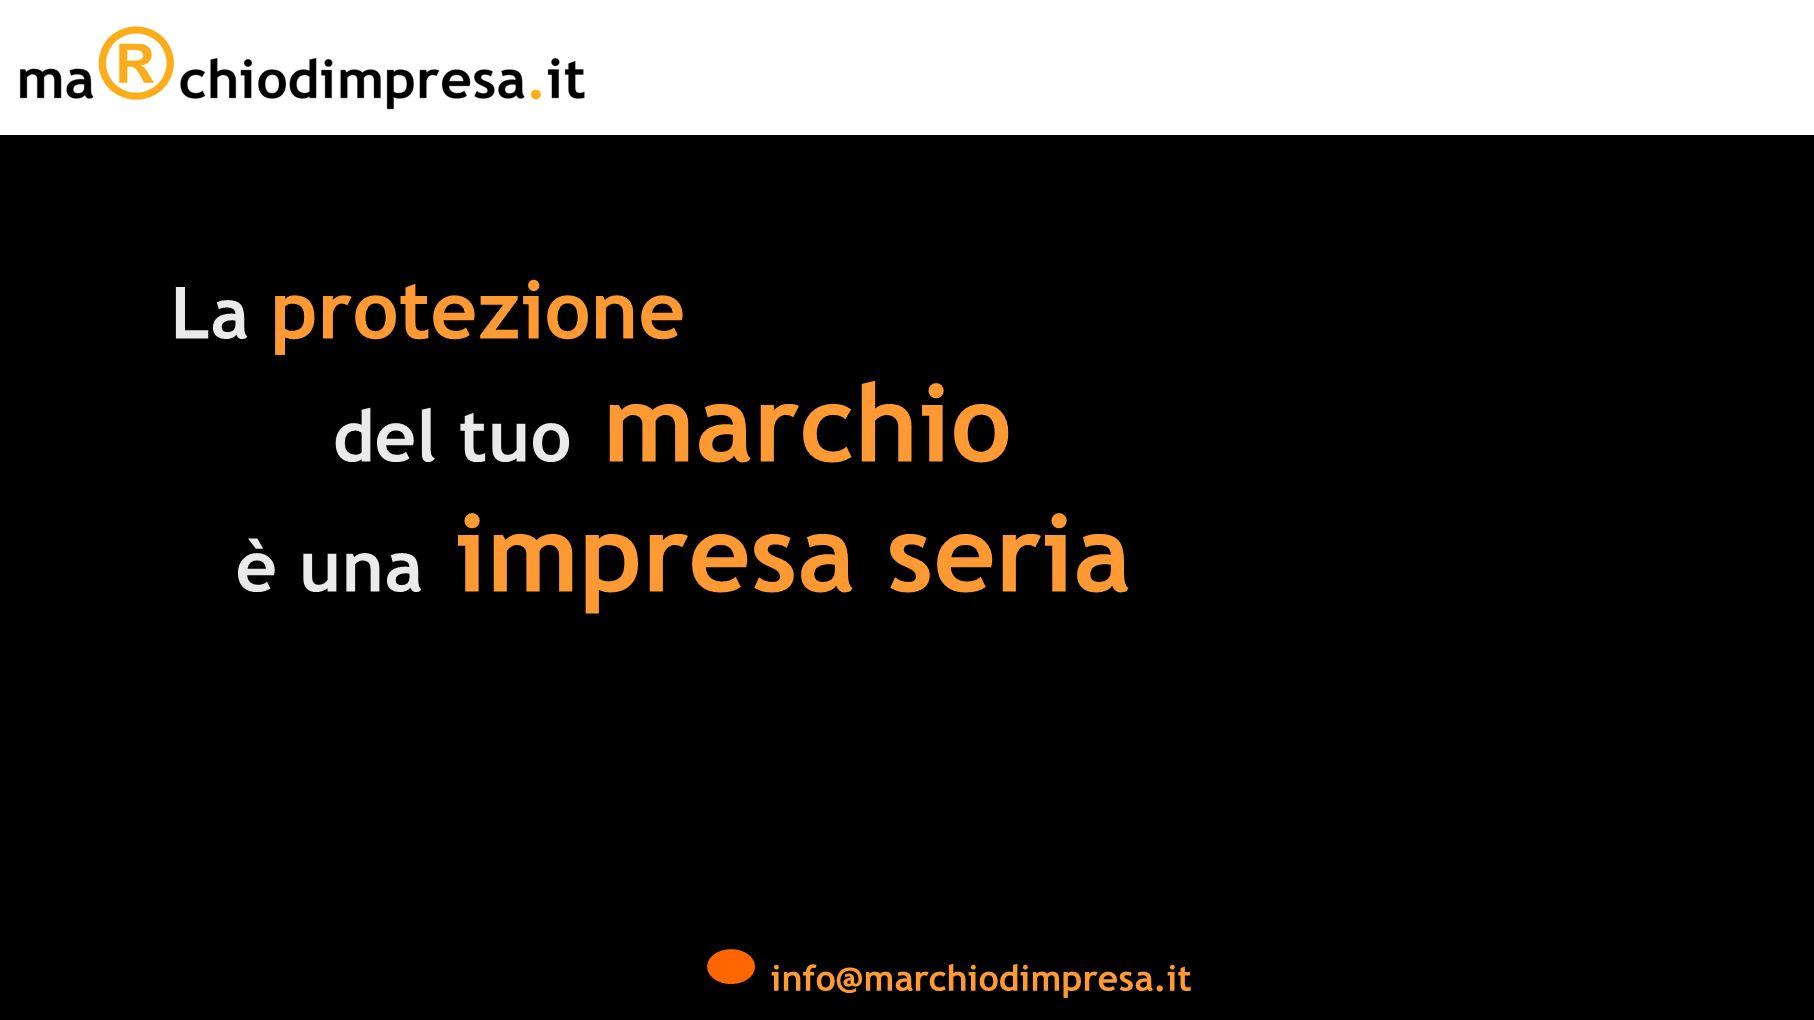 info@marchiodimpresa.it Perché ma ® chiodimpresa.it .